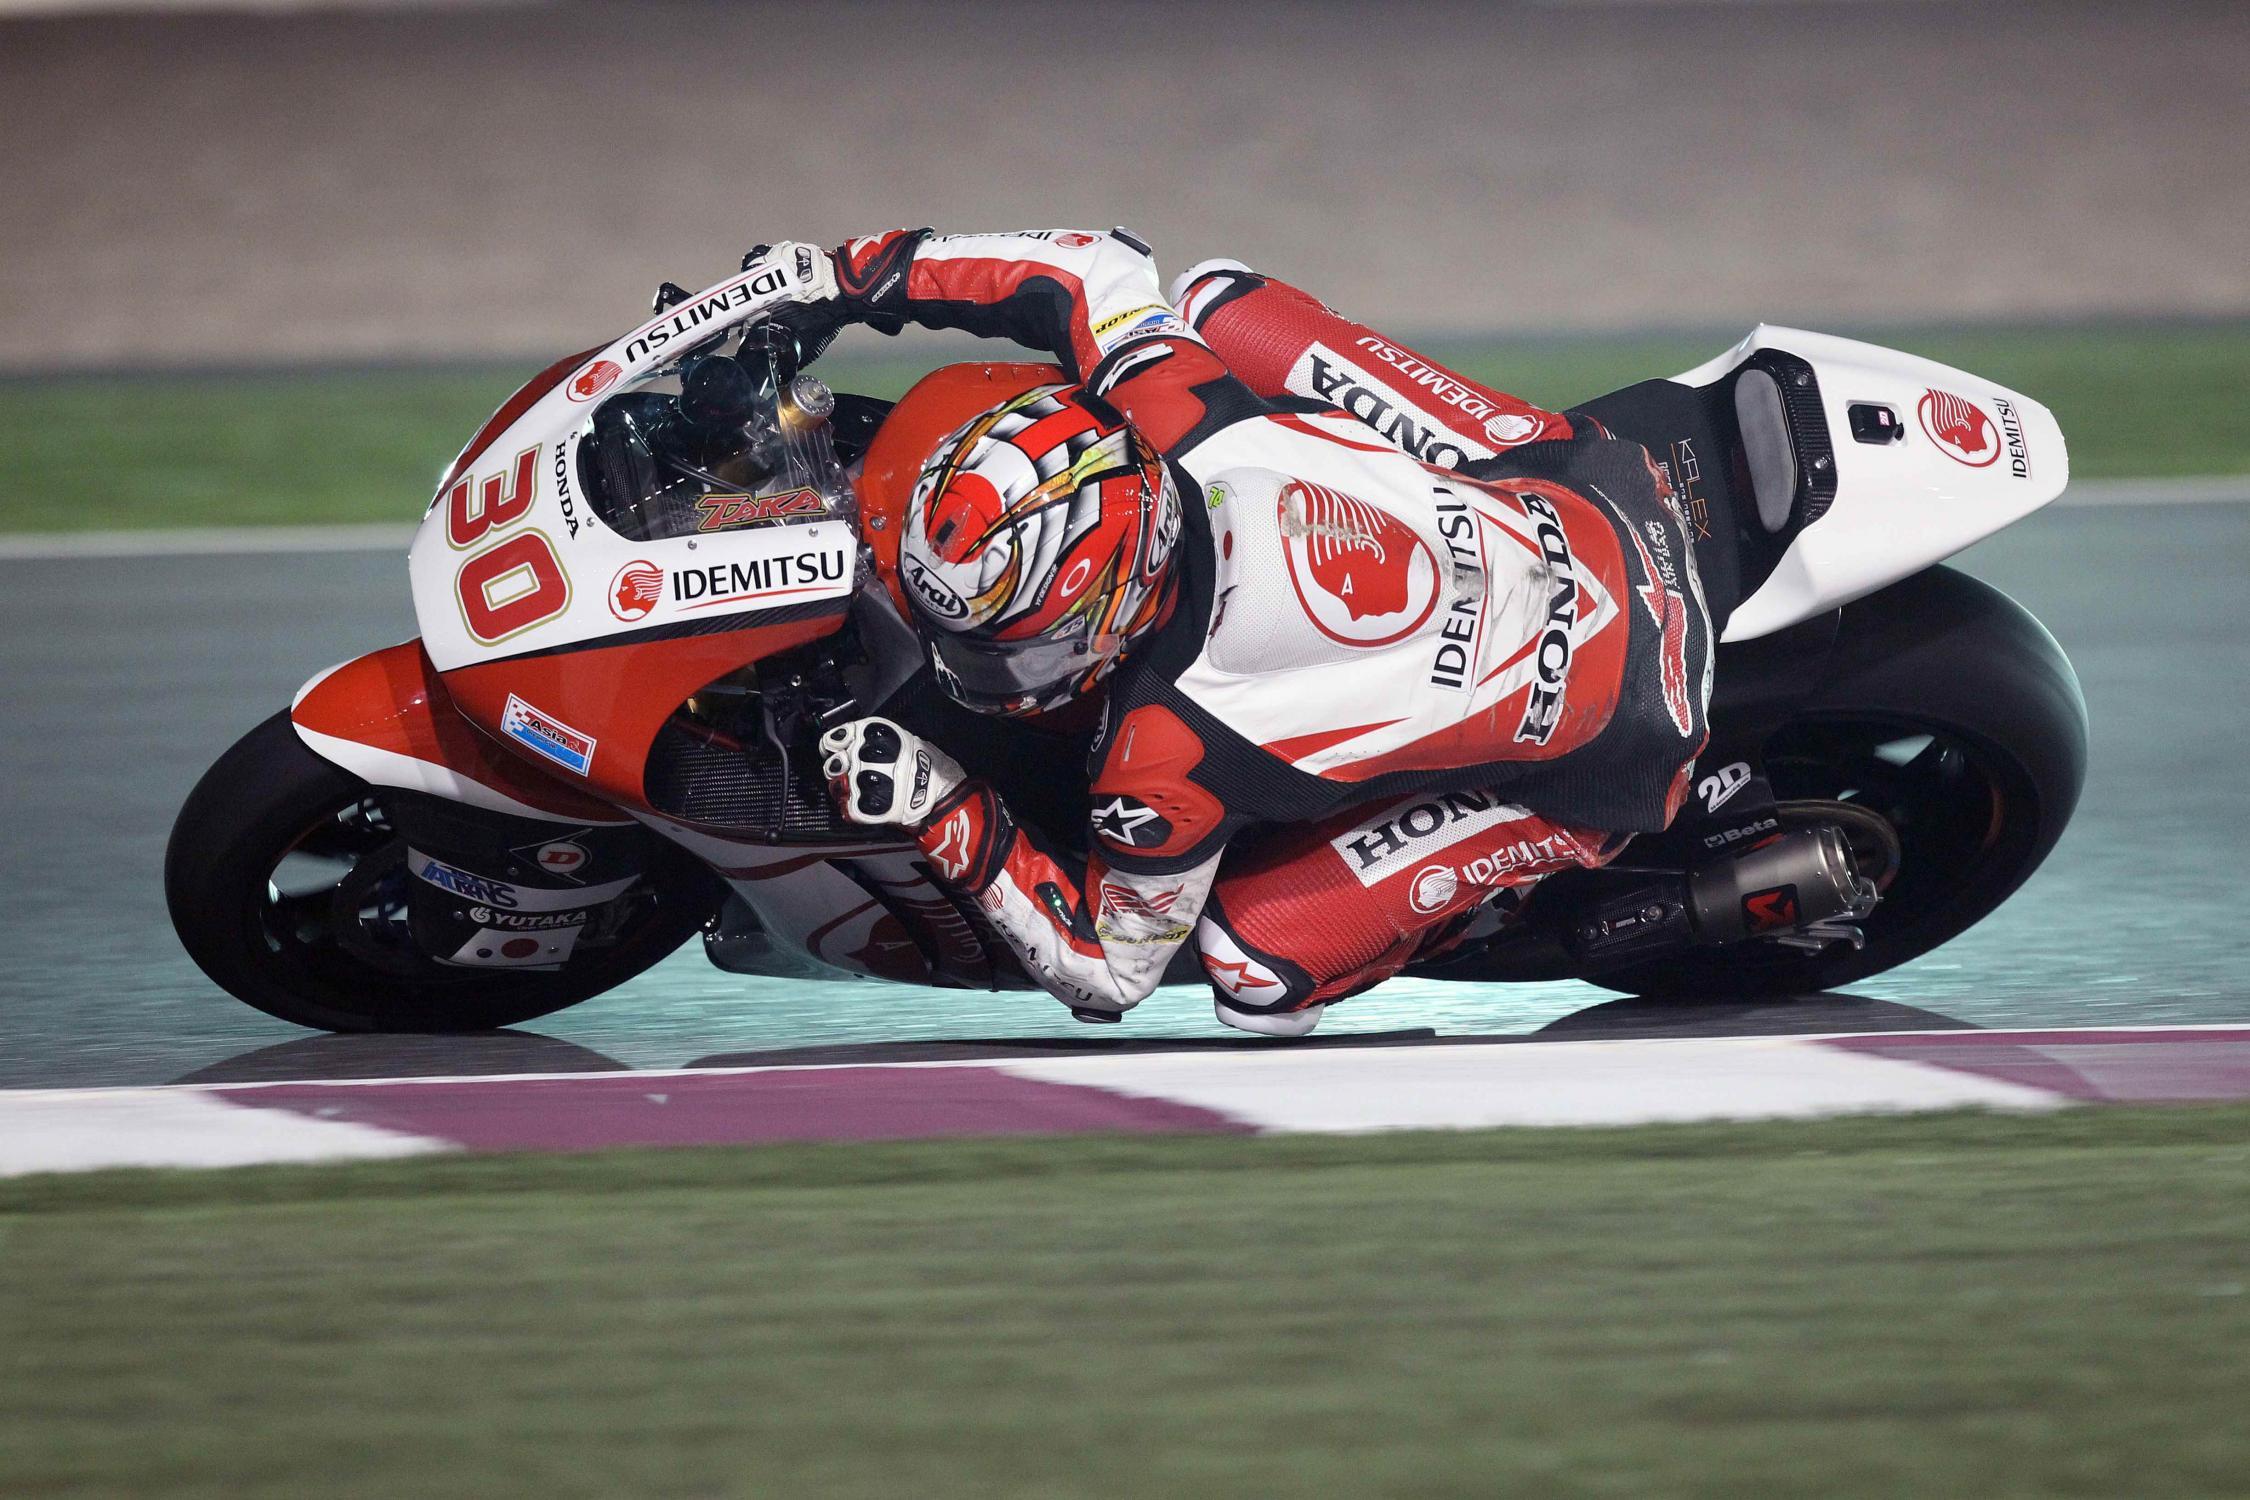 Test Moto3/Moto2 Qatar 2016 30-nakagami_moto2_mg4_5308.gallery_full_top_fullscreen